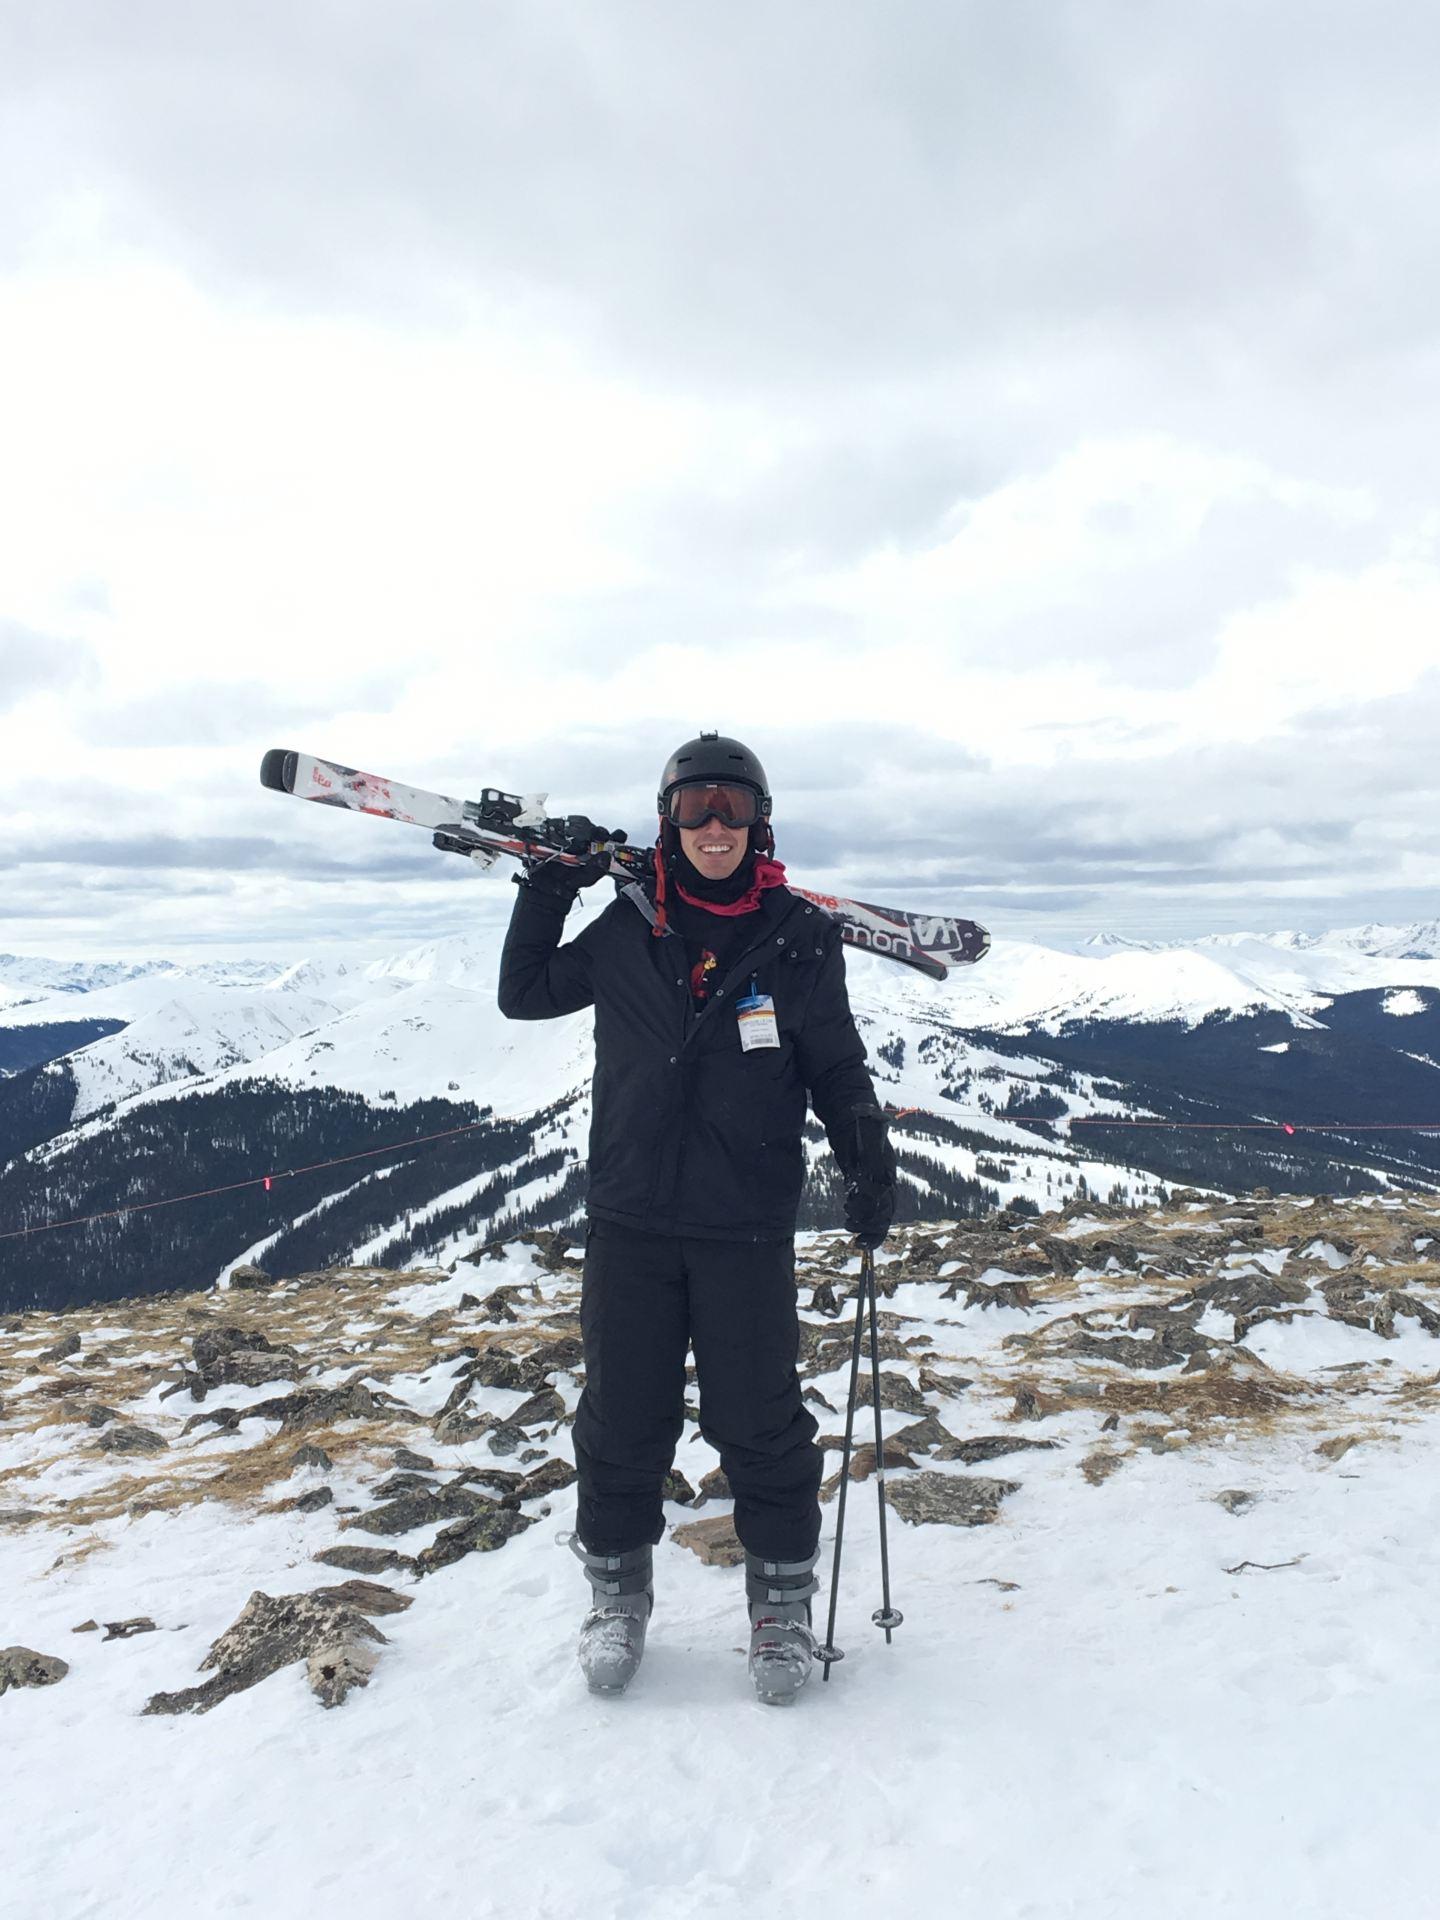 Harrison Krebs on a ski trip